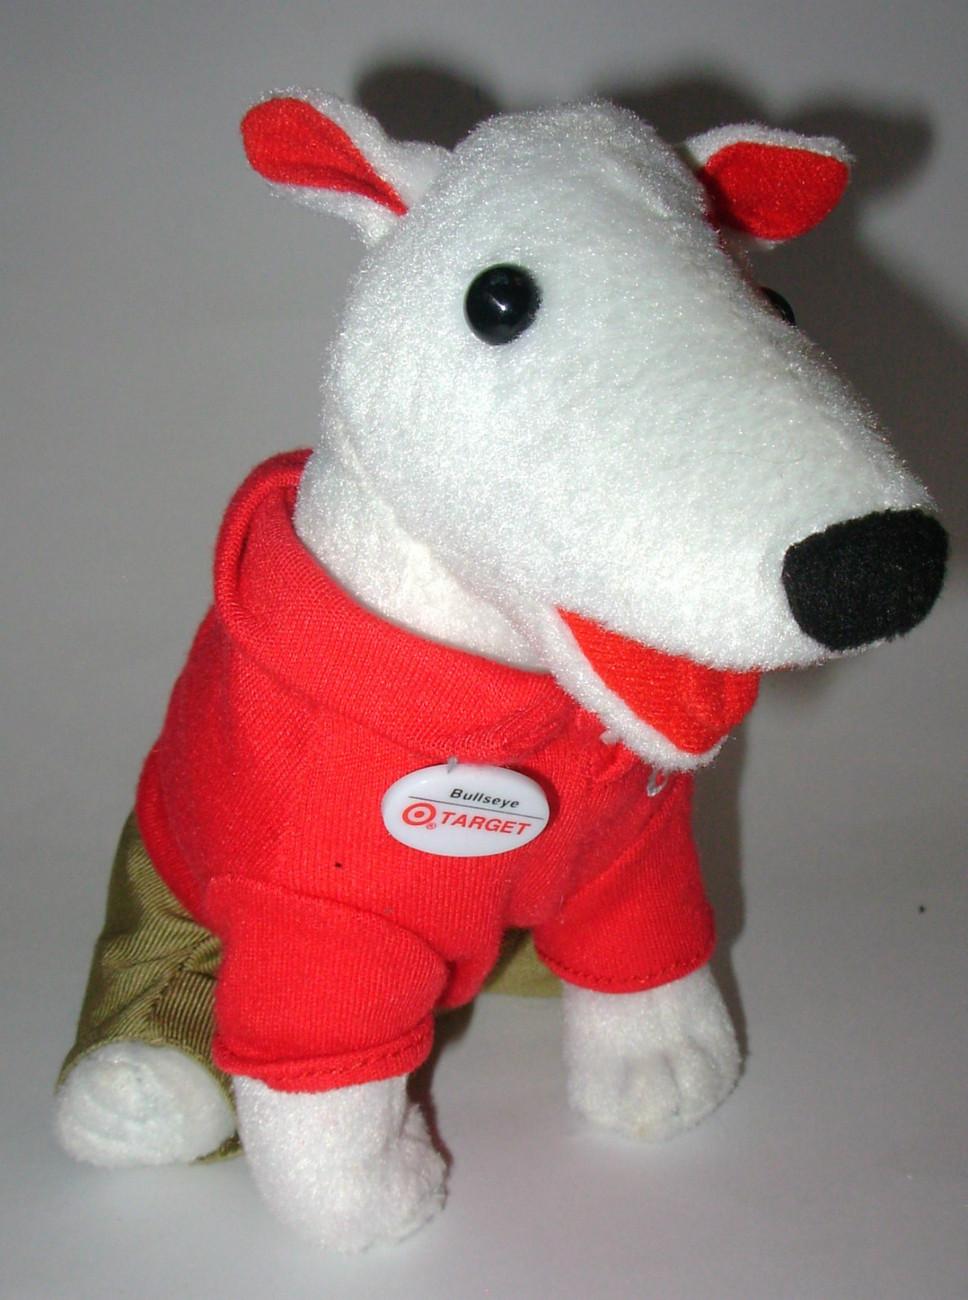 Plush Target Target Bullseye Plush Mascot